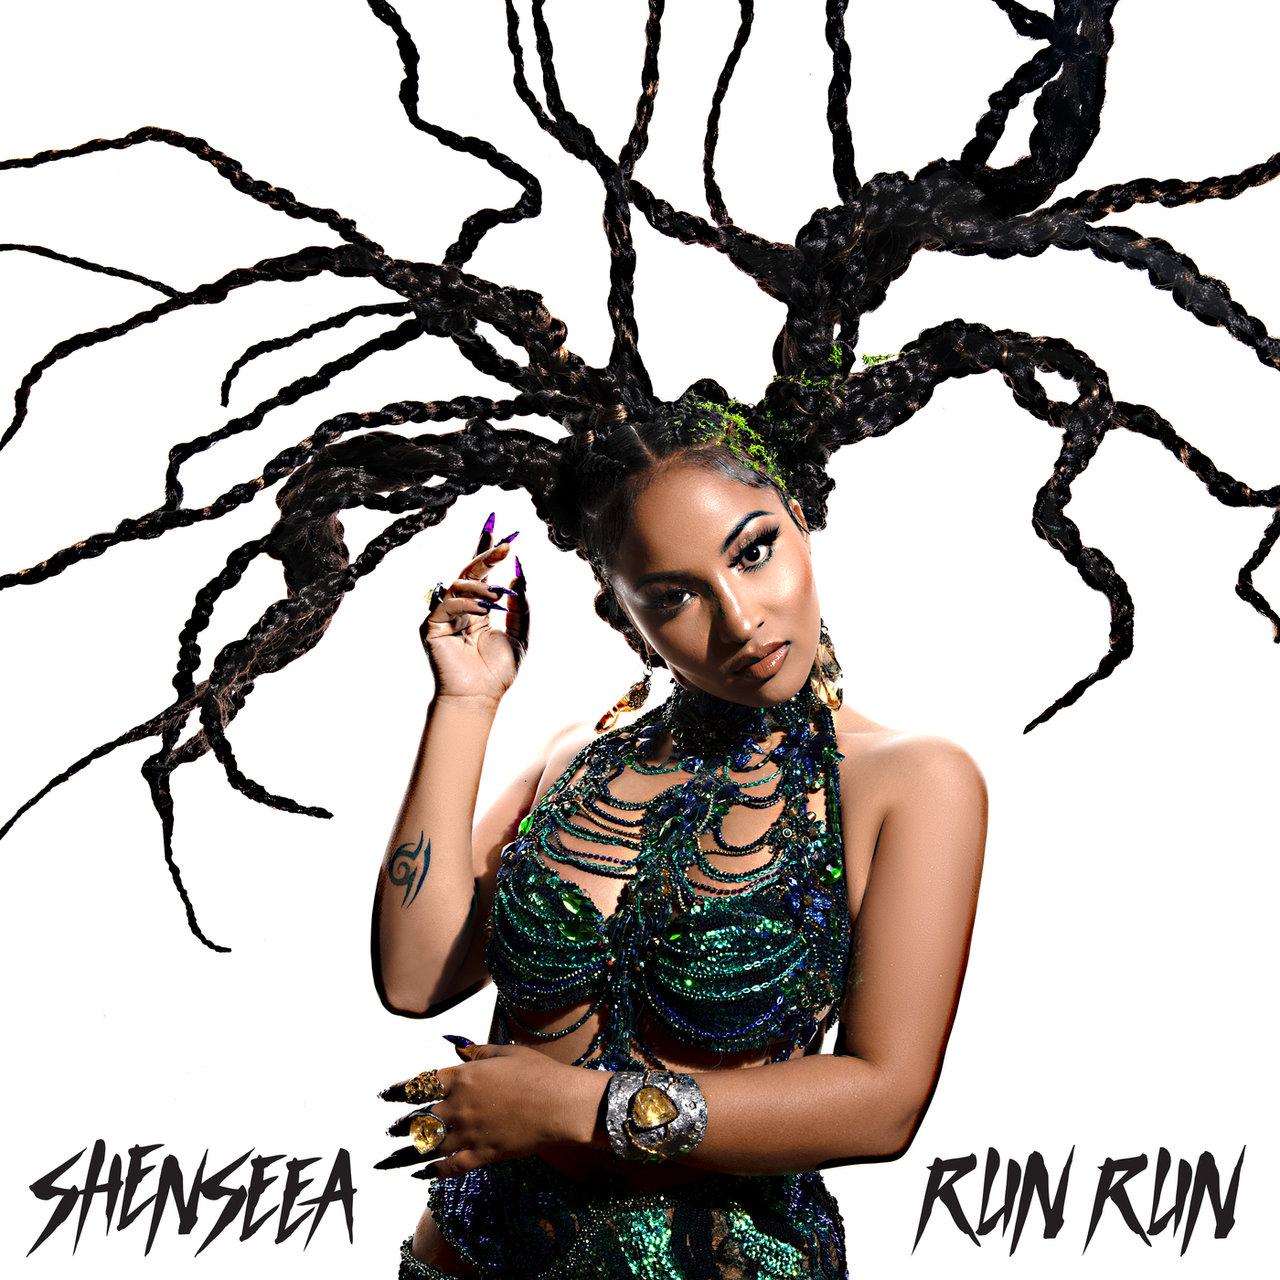 Shenseea - Run Run (Cover)